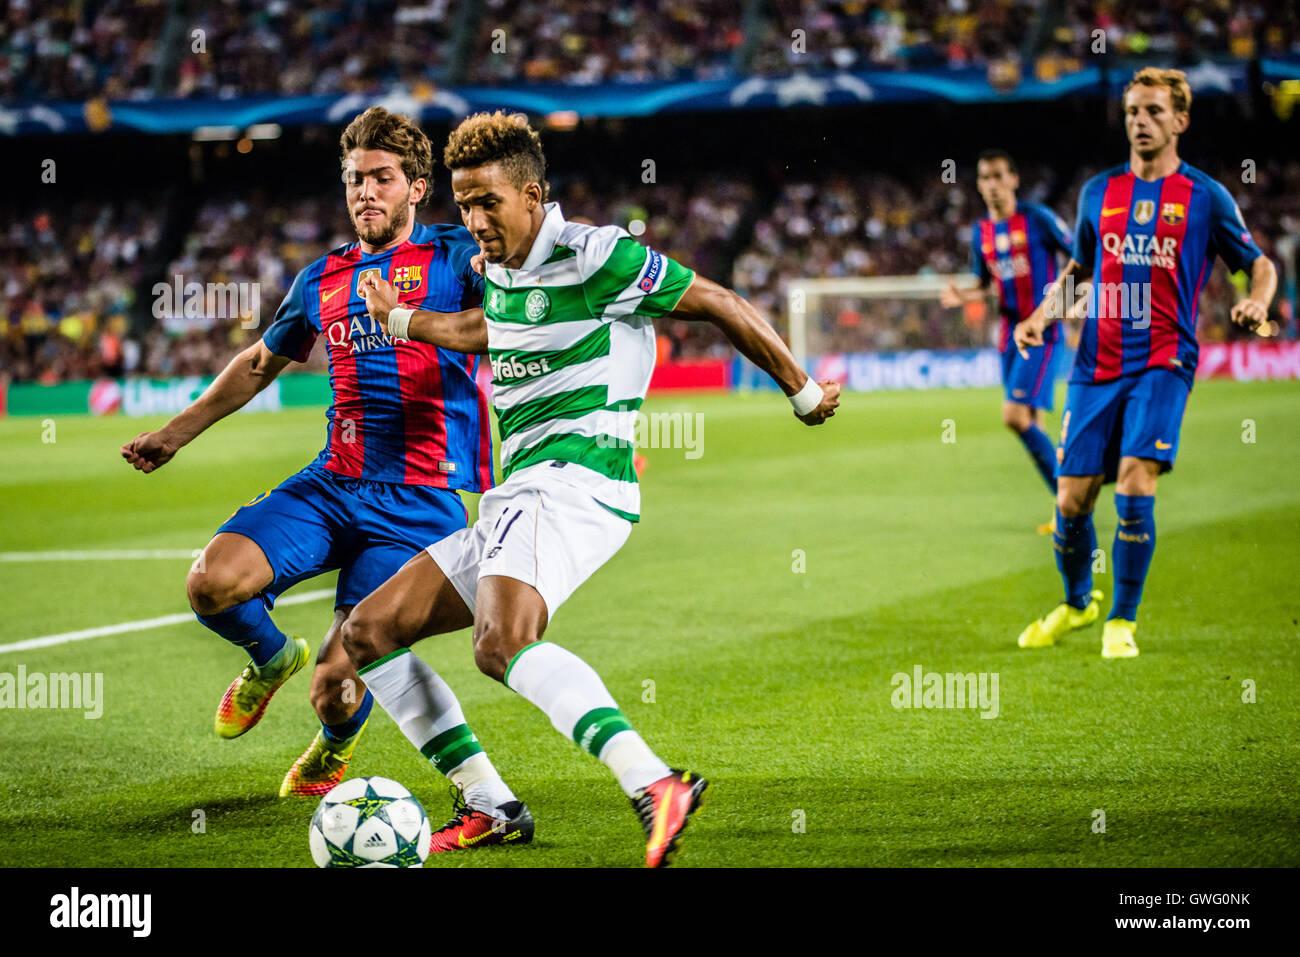 Barcelona, Catalonia, Spain. 13th Sep, 2016. FC Barcelona midfielder S. ROBERTO in action against Celtic midfielder - Stock Image